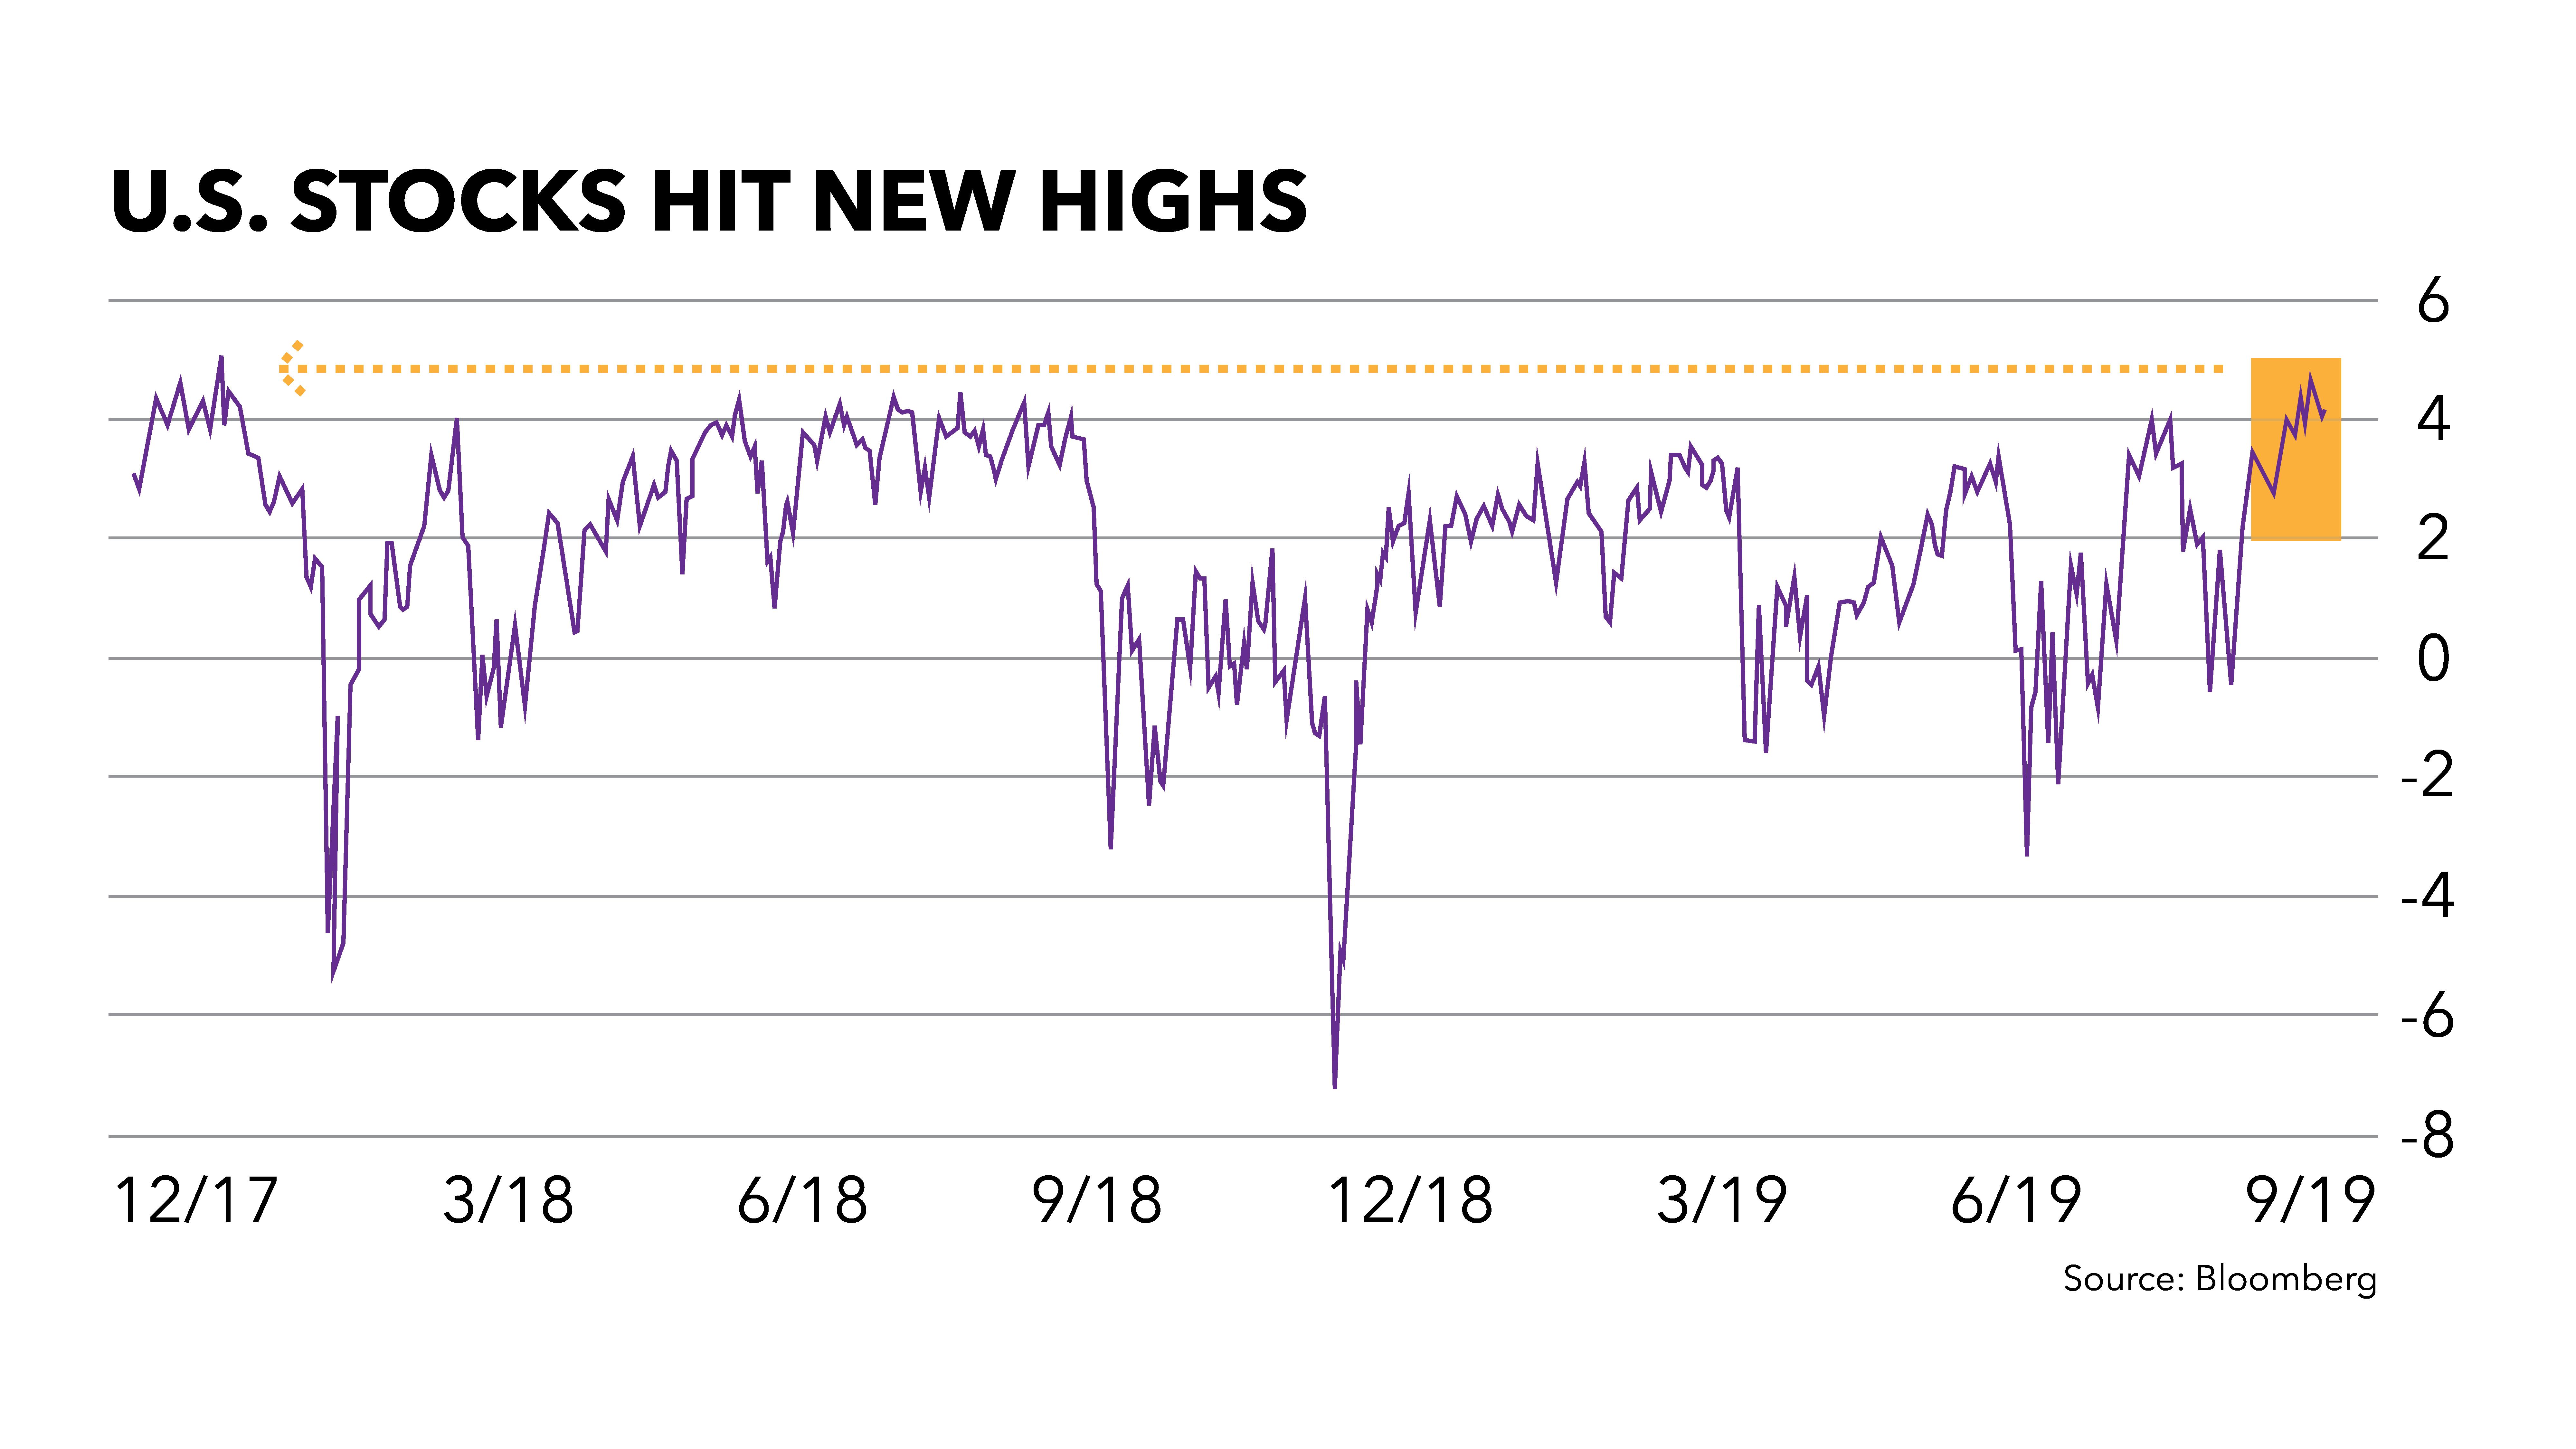 U.S. stock market chart